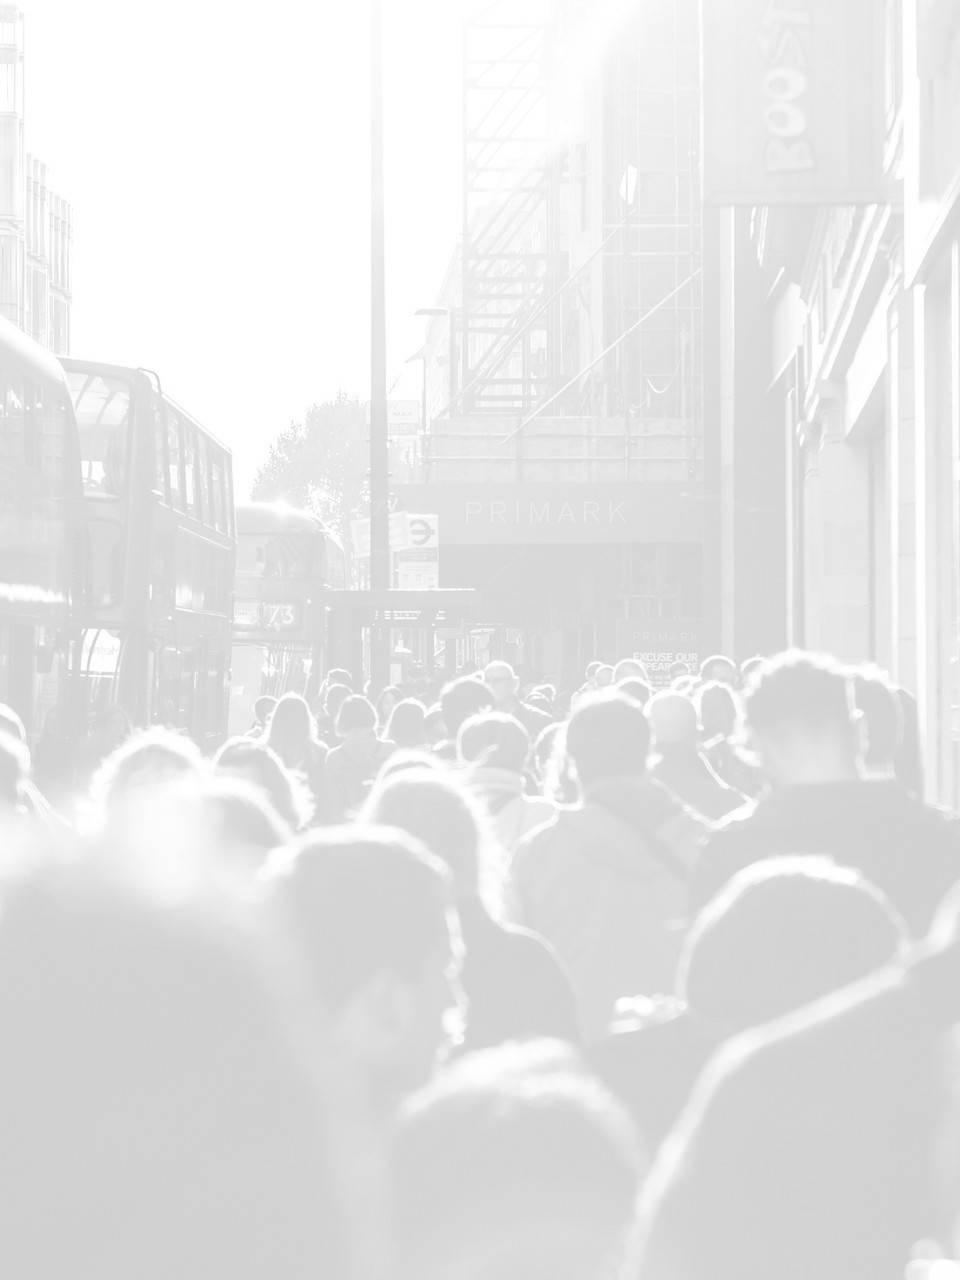 seo company in london image of london high street